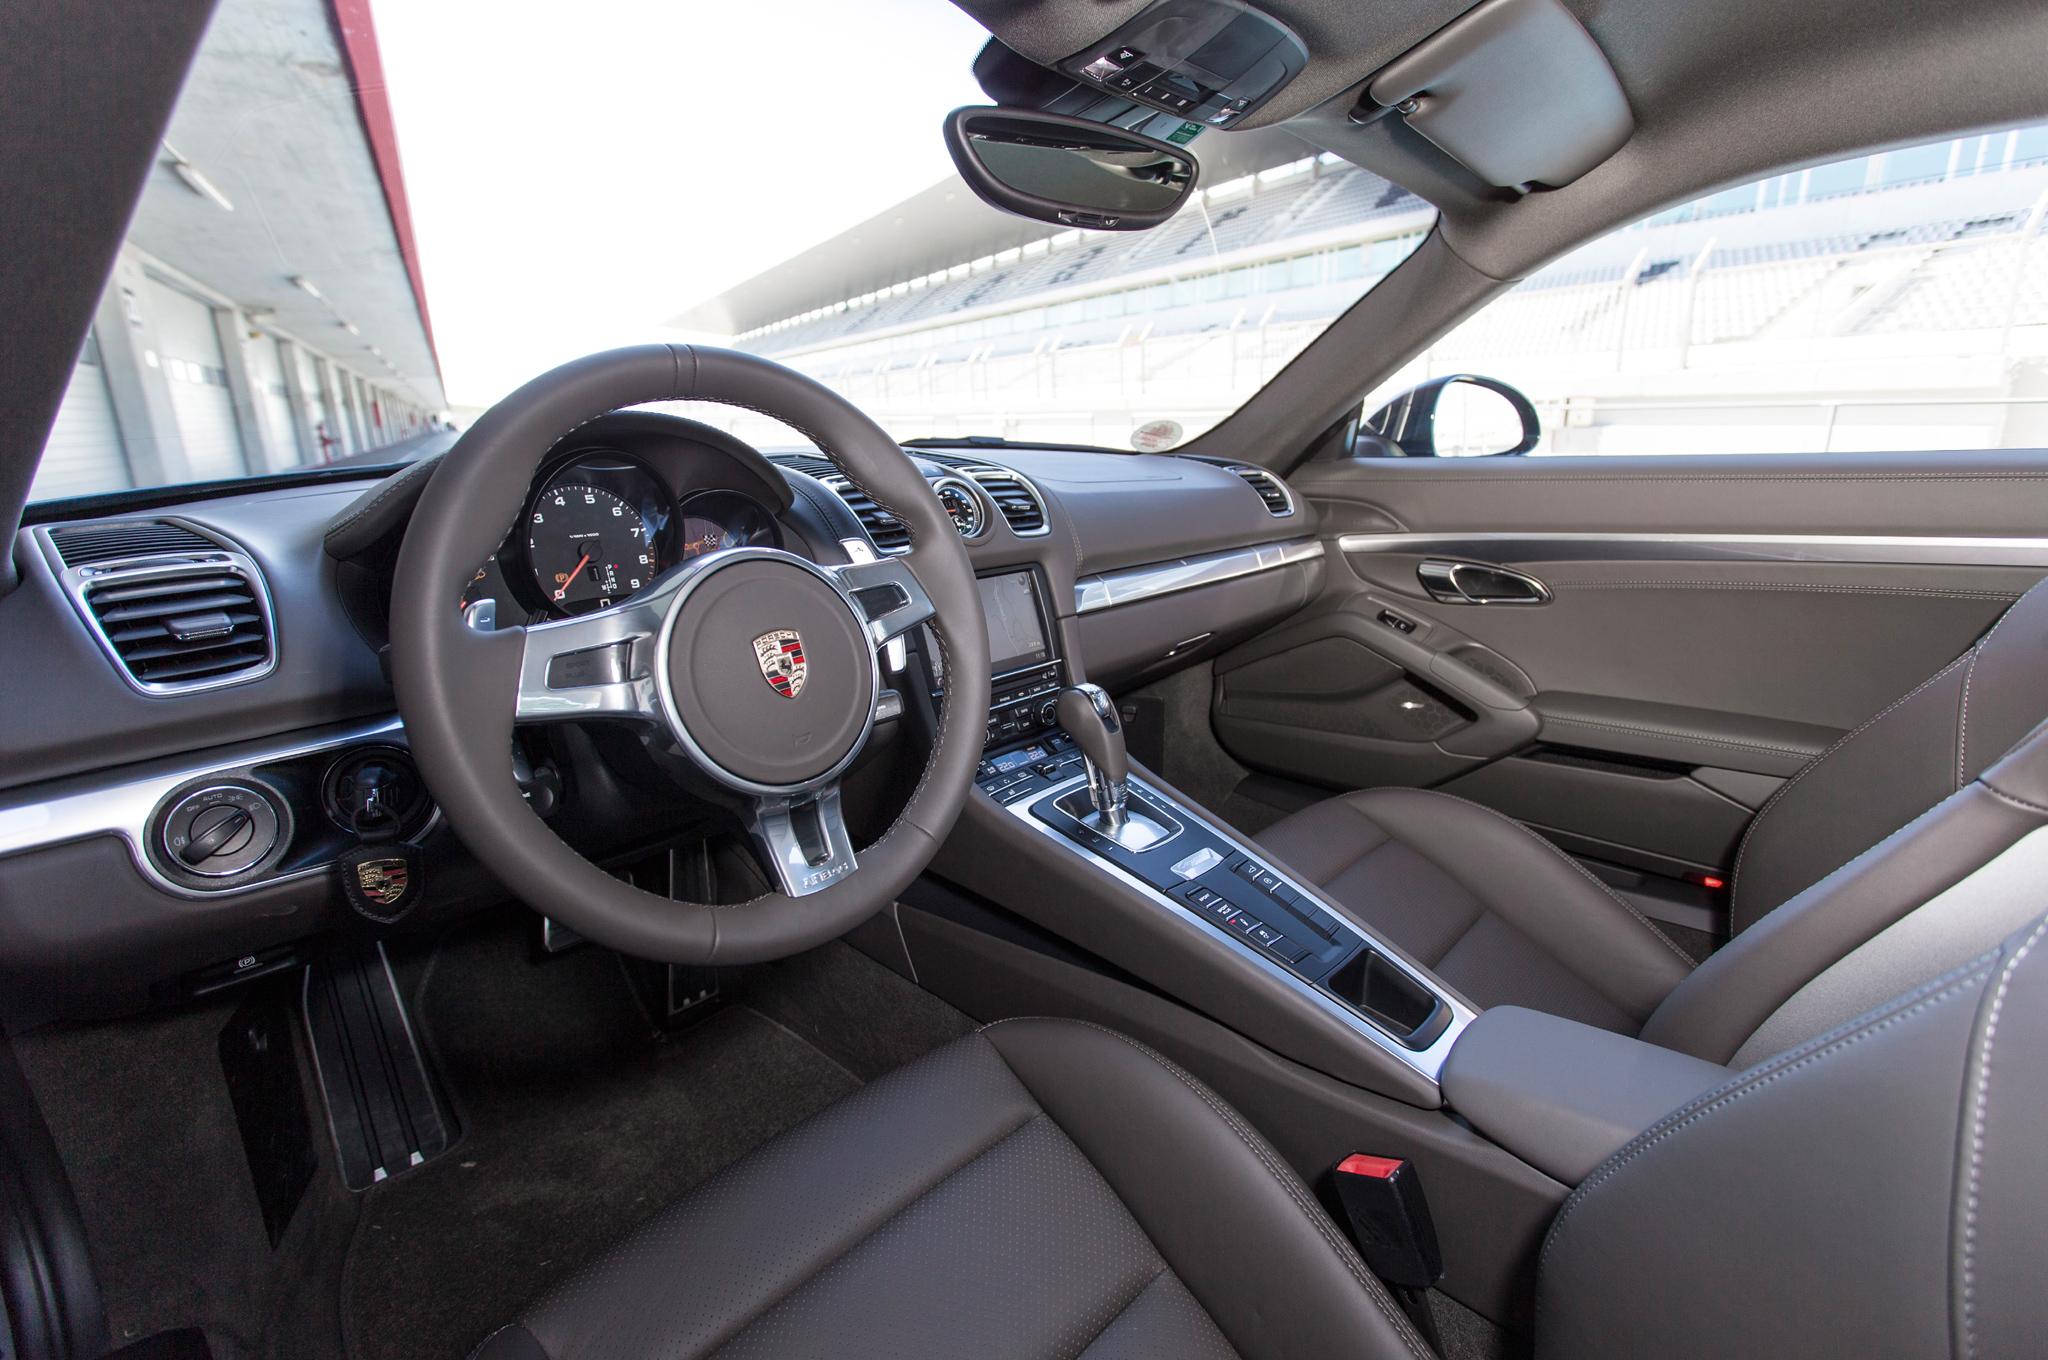 2014 porsche cayman cockpit and dashboard 2015 porsche cayman gts side exterior preview 2014 porsche